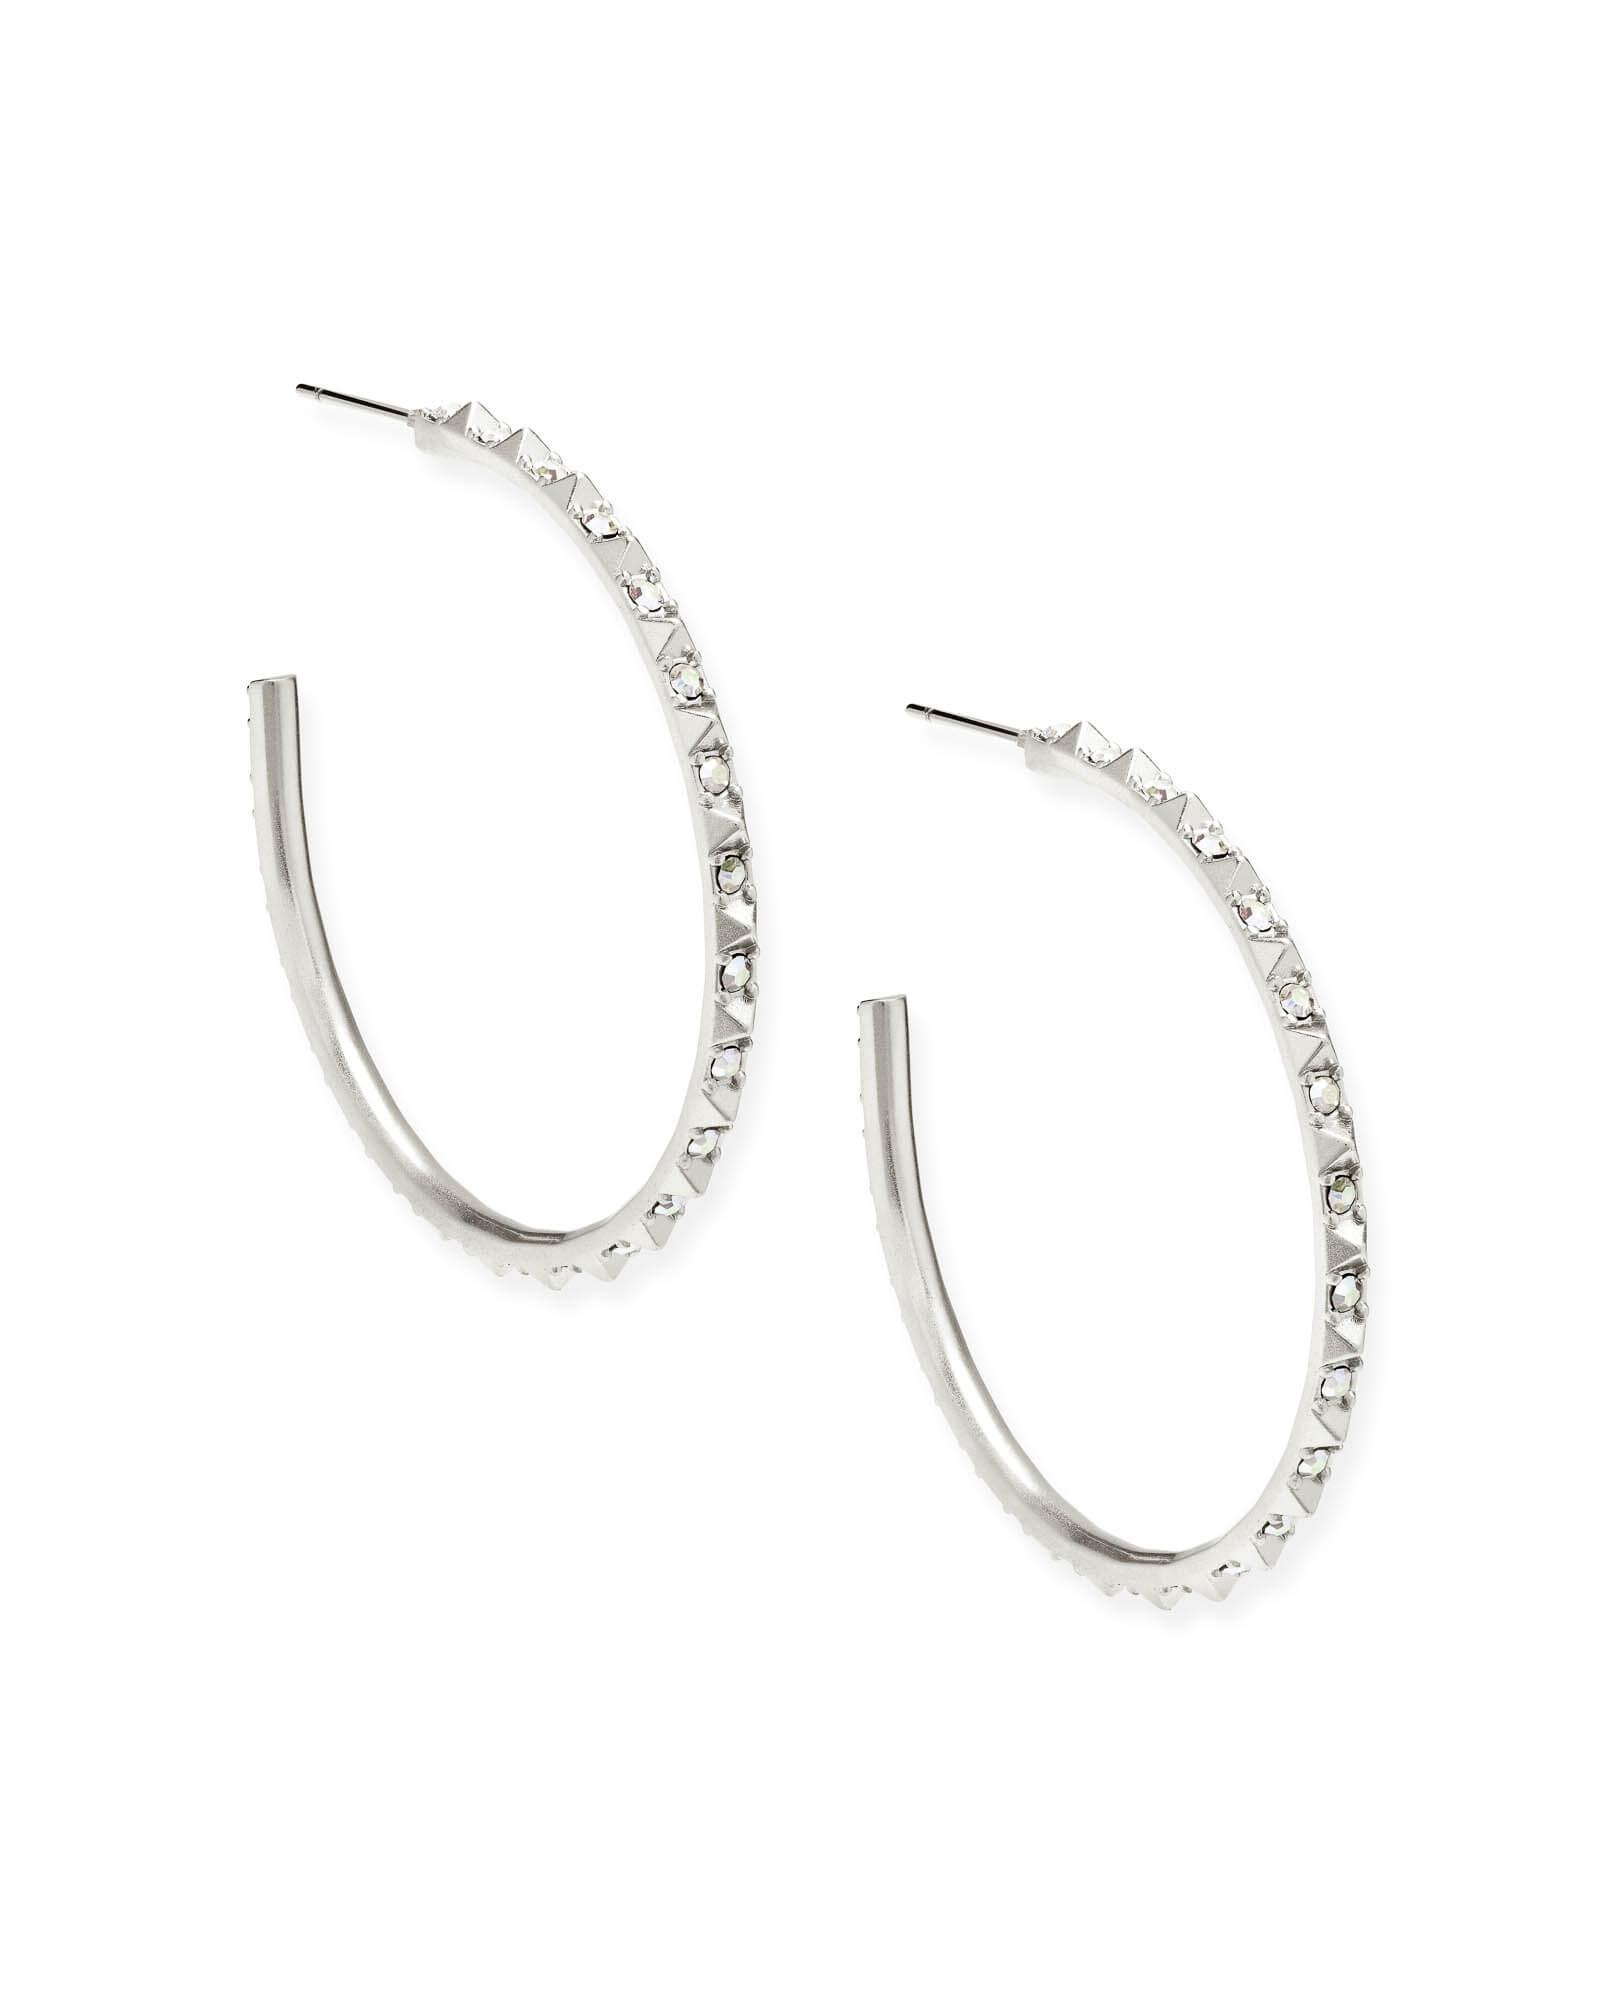 8d483c6ed Veronica Hoop Earrings in Silver | KendraScott